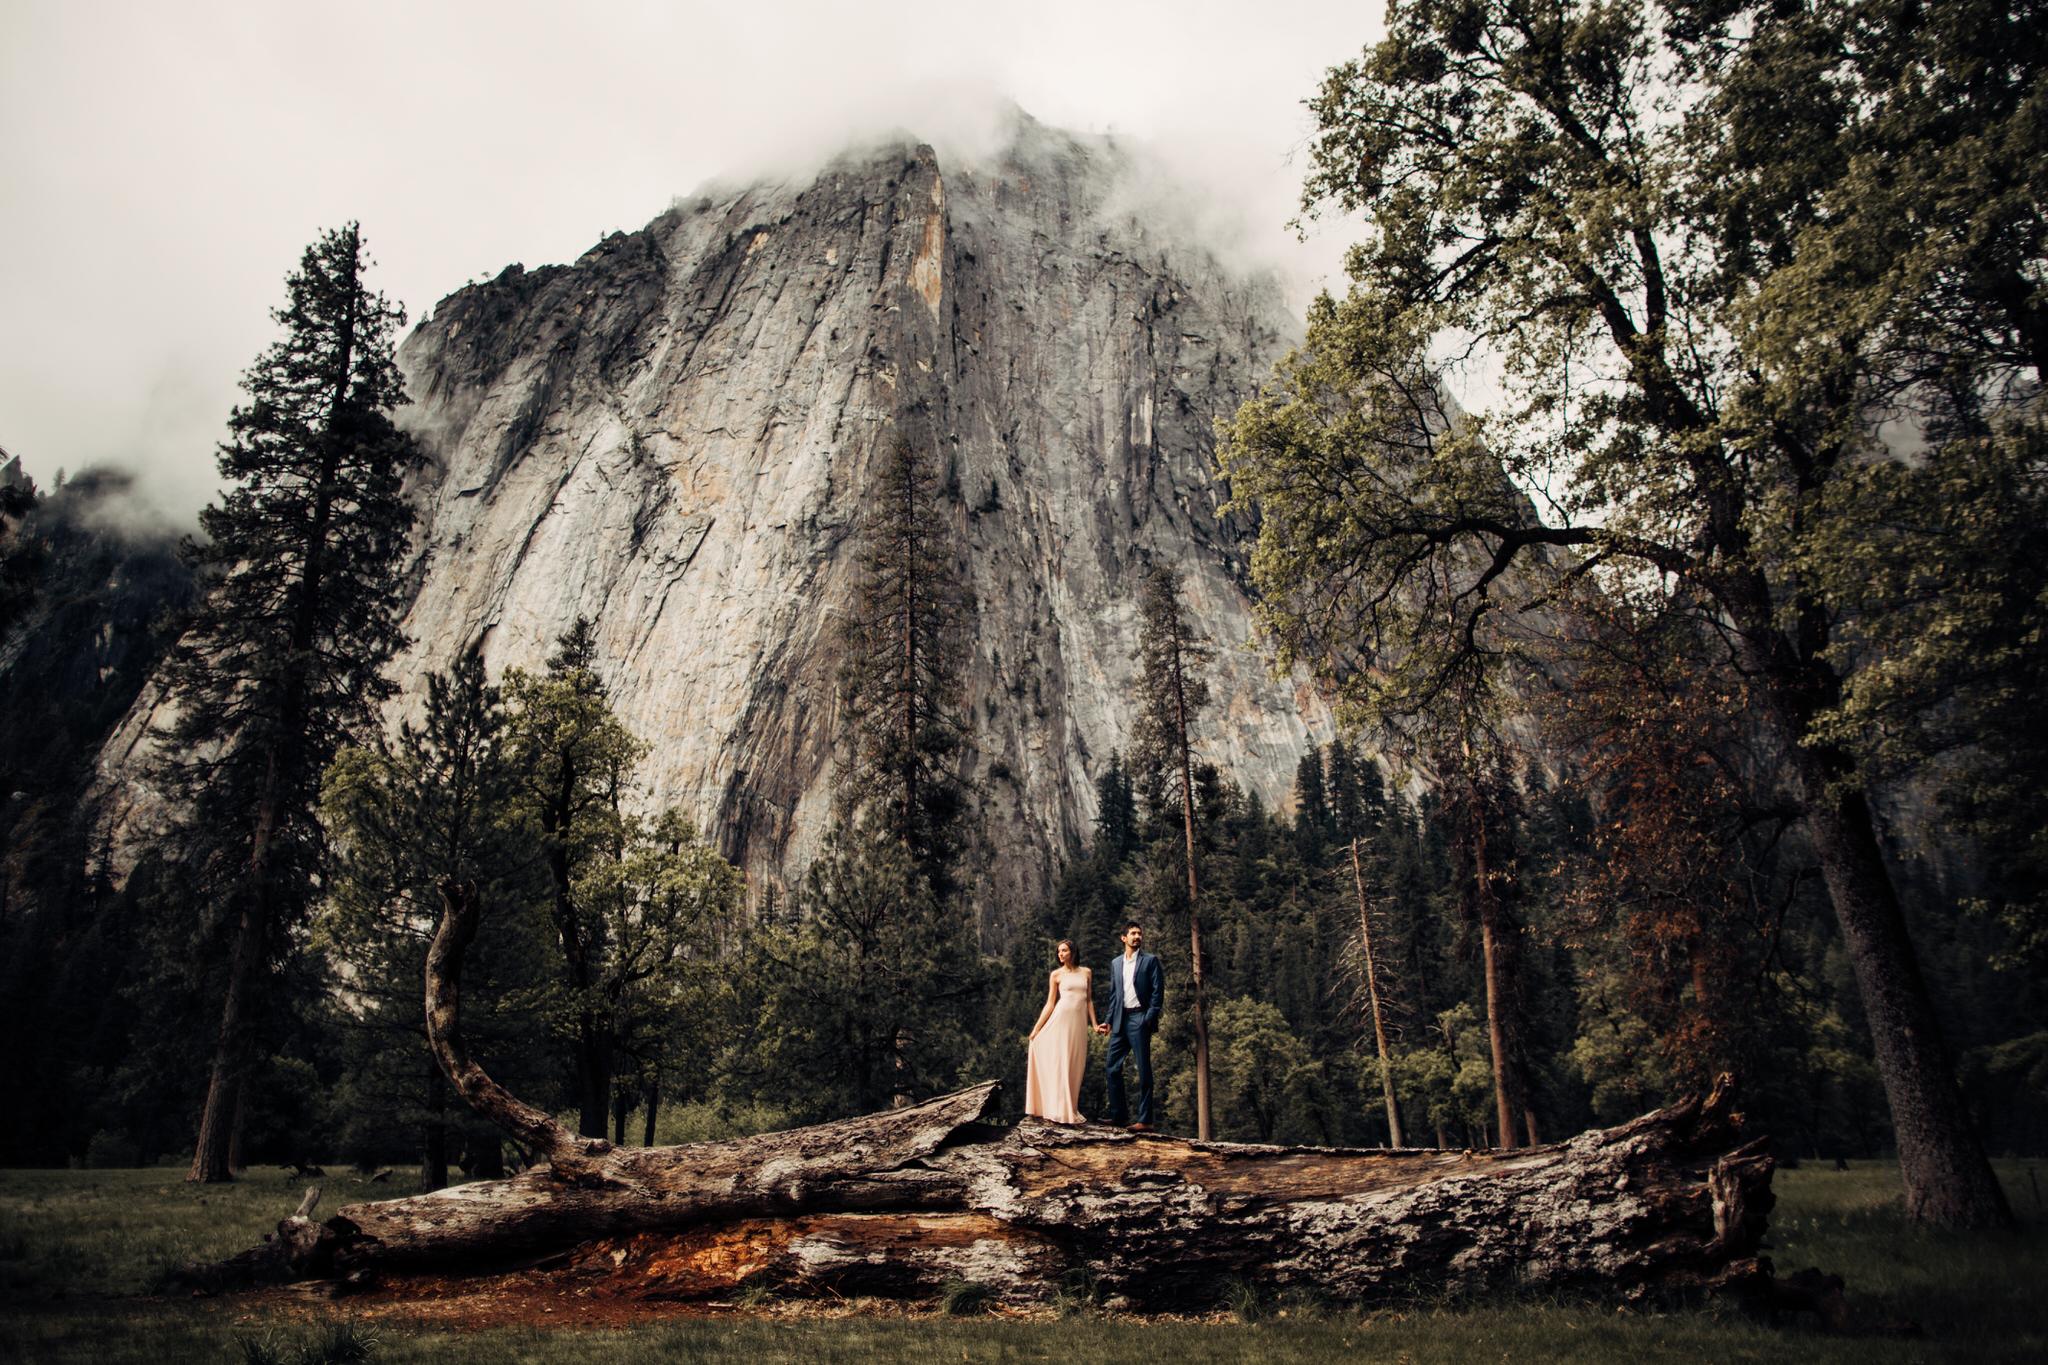 Yosemite-engagement-session-lauren-and-tom80.jpg